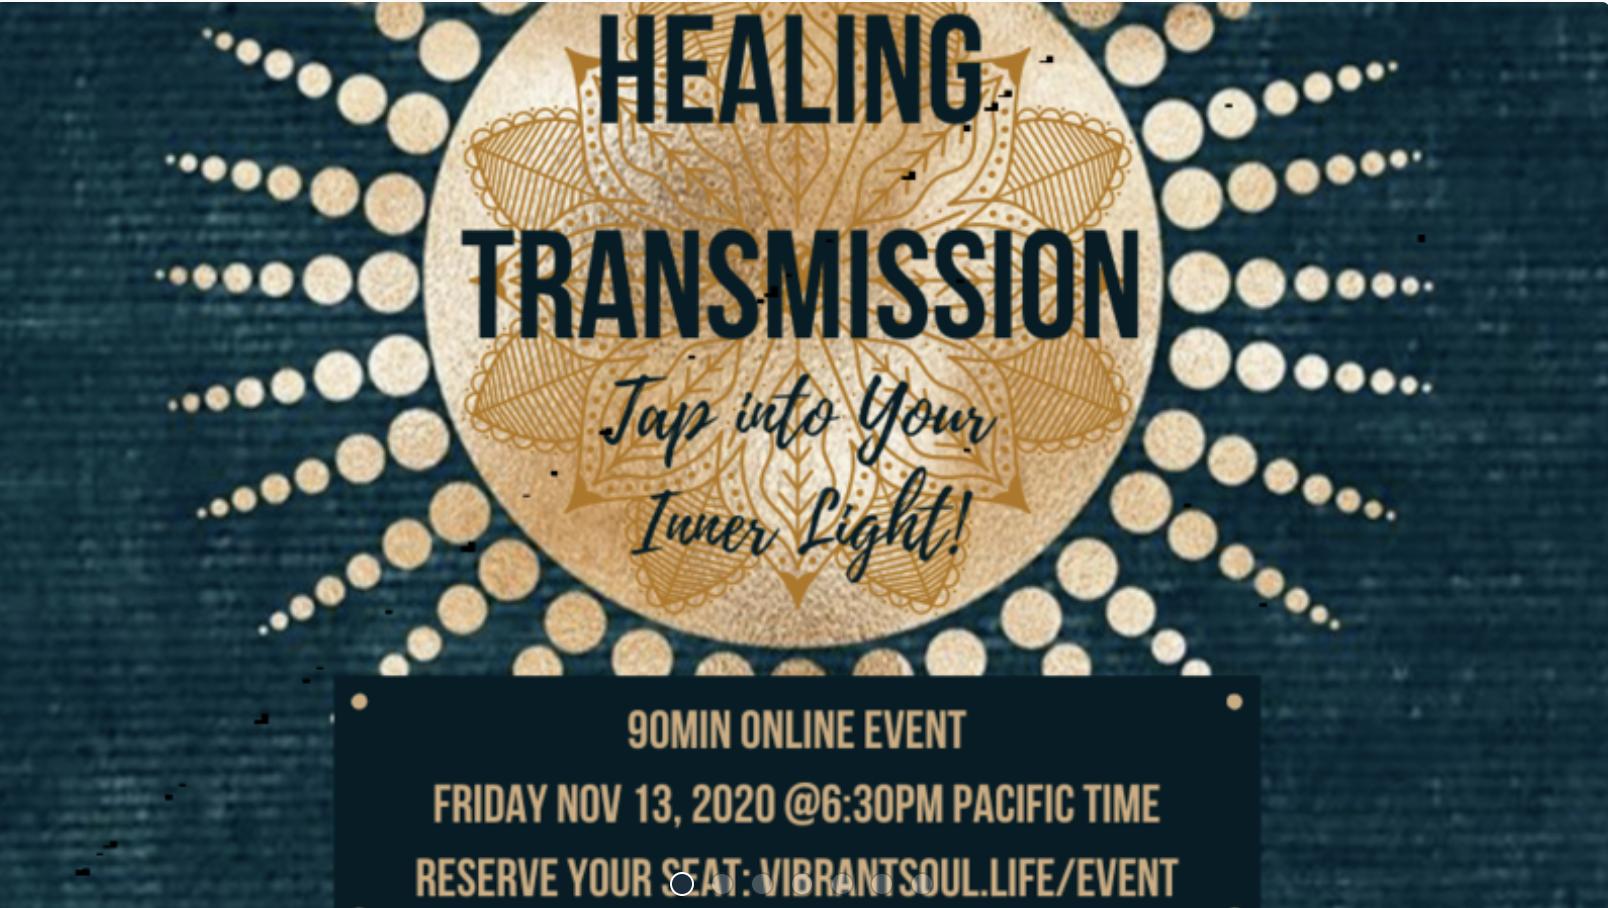 HealingTransmission.png